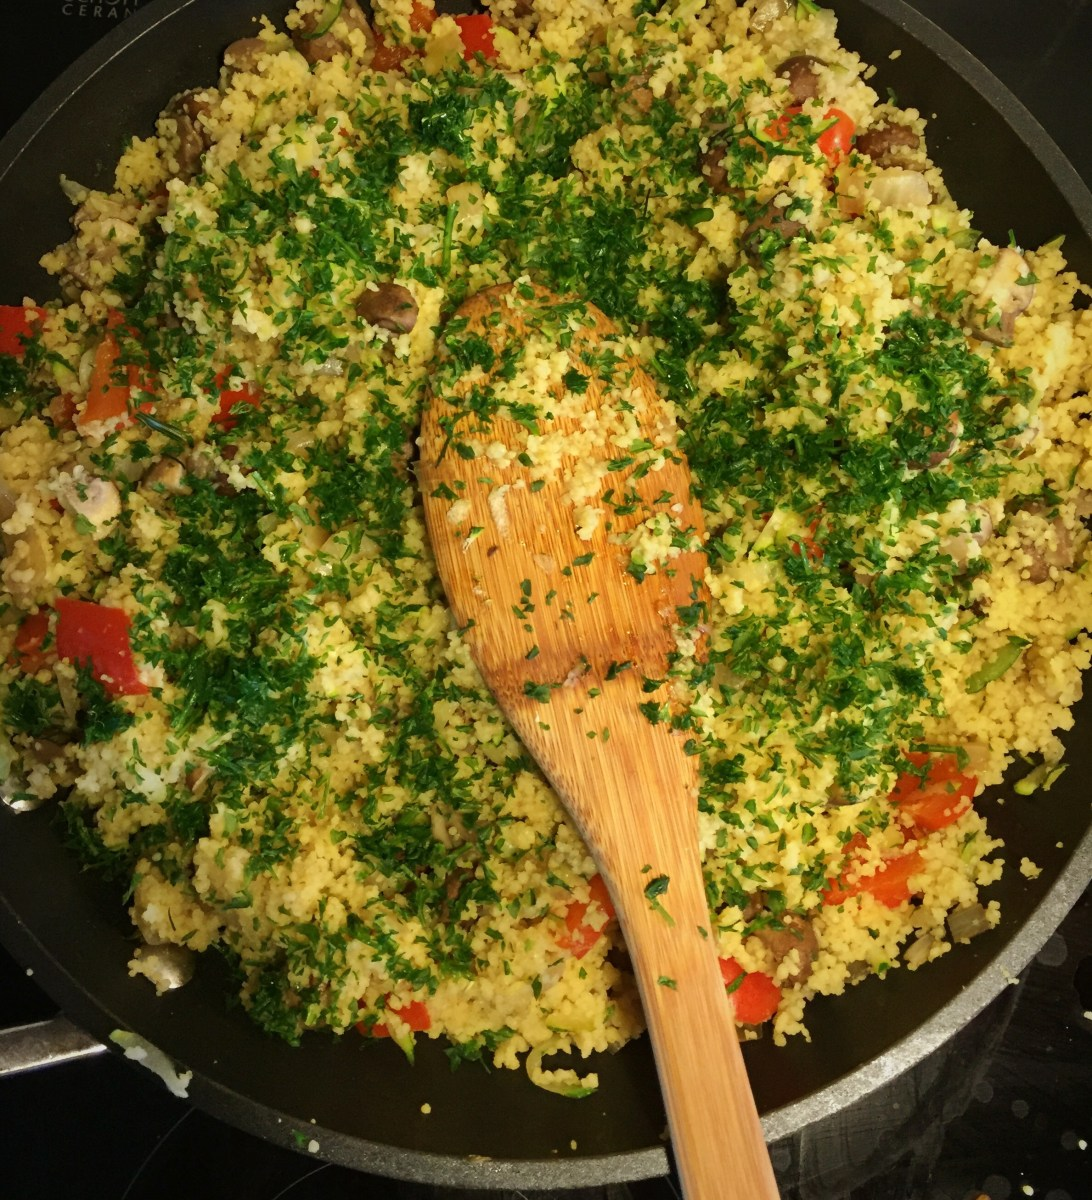 Veckans vegetariska: Couscouspytt